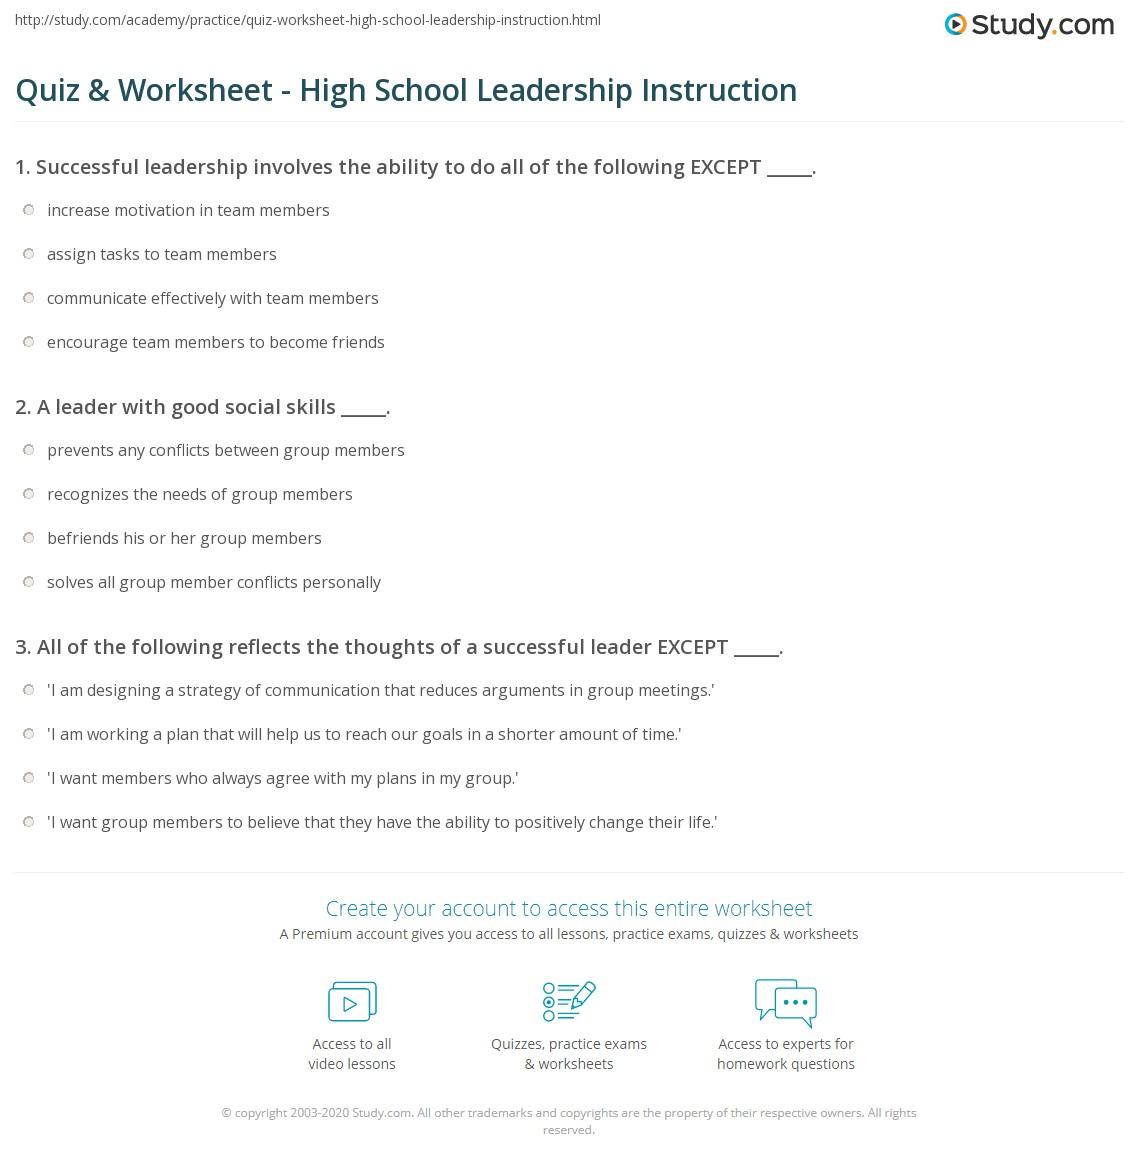 worksheet Worksheets For High School quiz worksheet high school leadership instruction study com print teaching to students worksheet